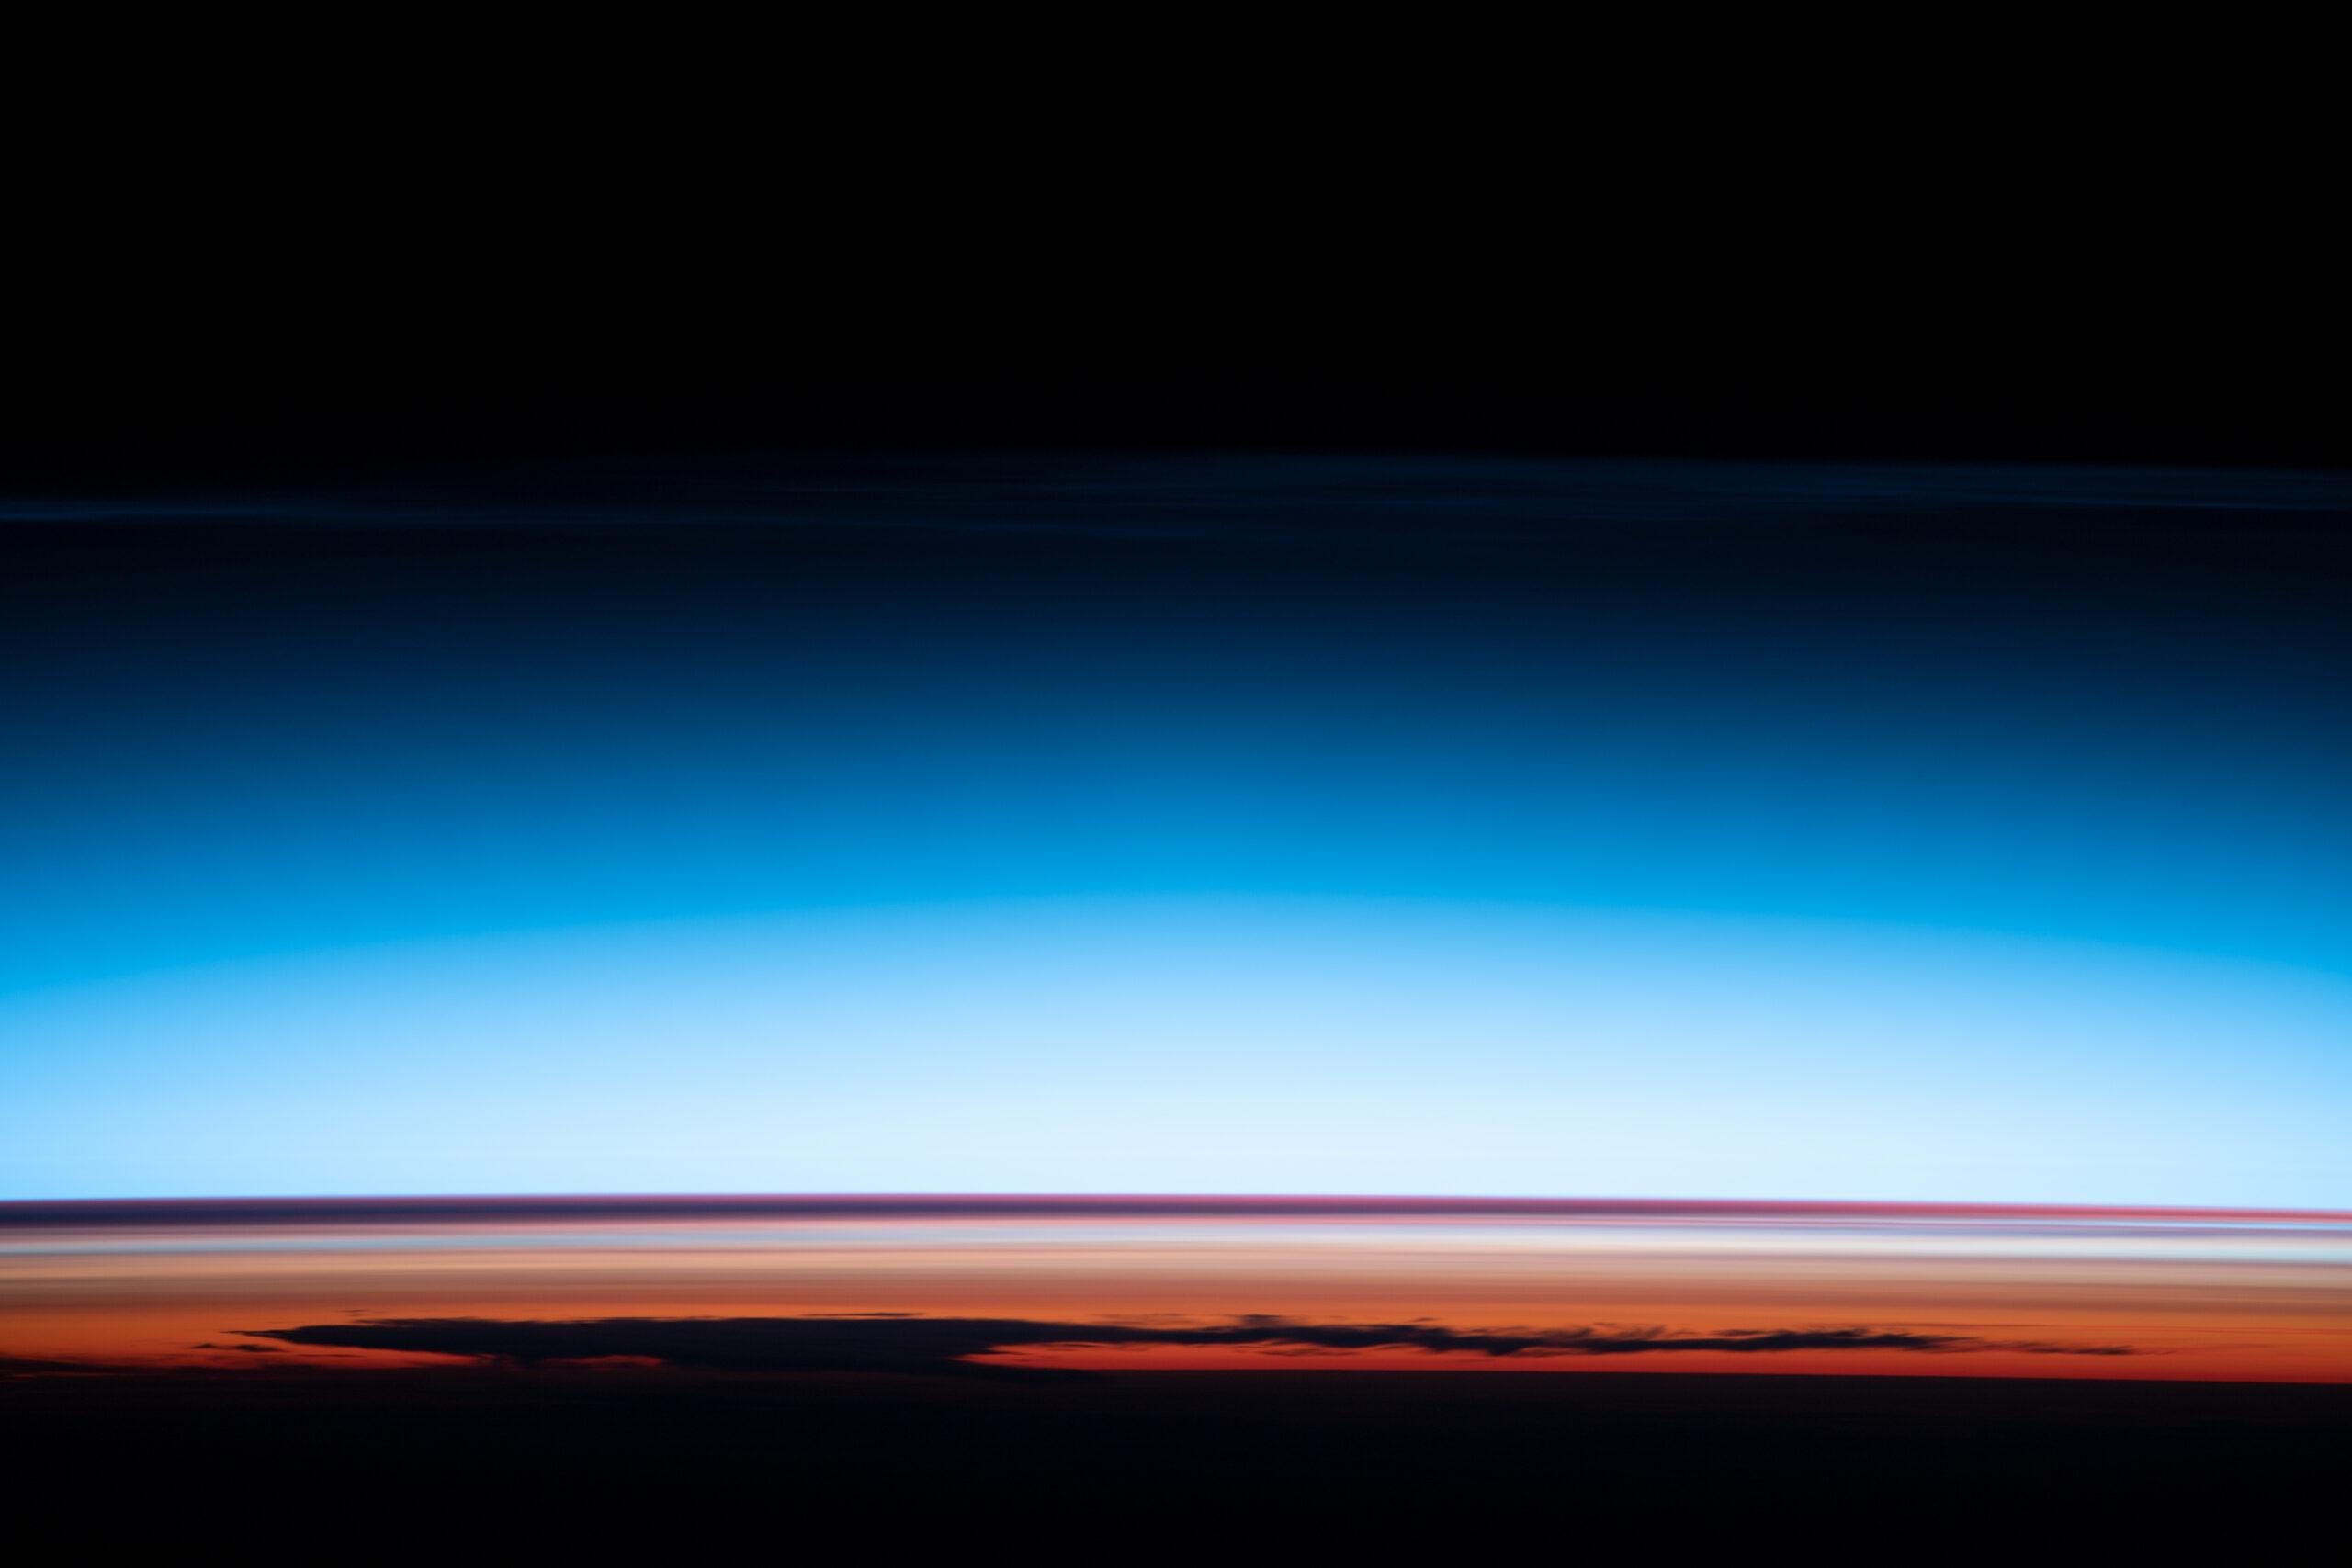 Earth Atmosphere